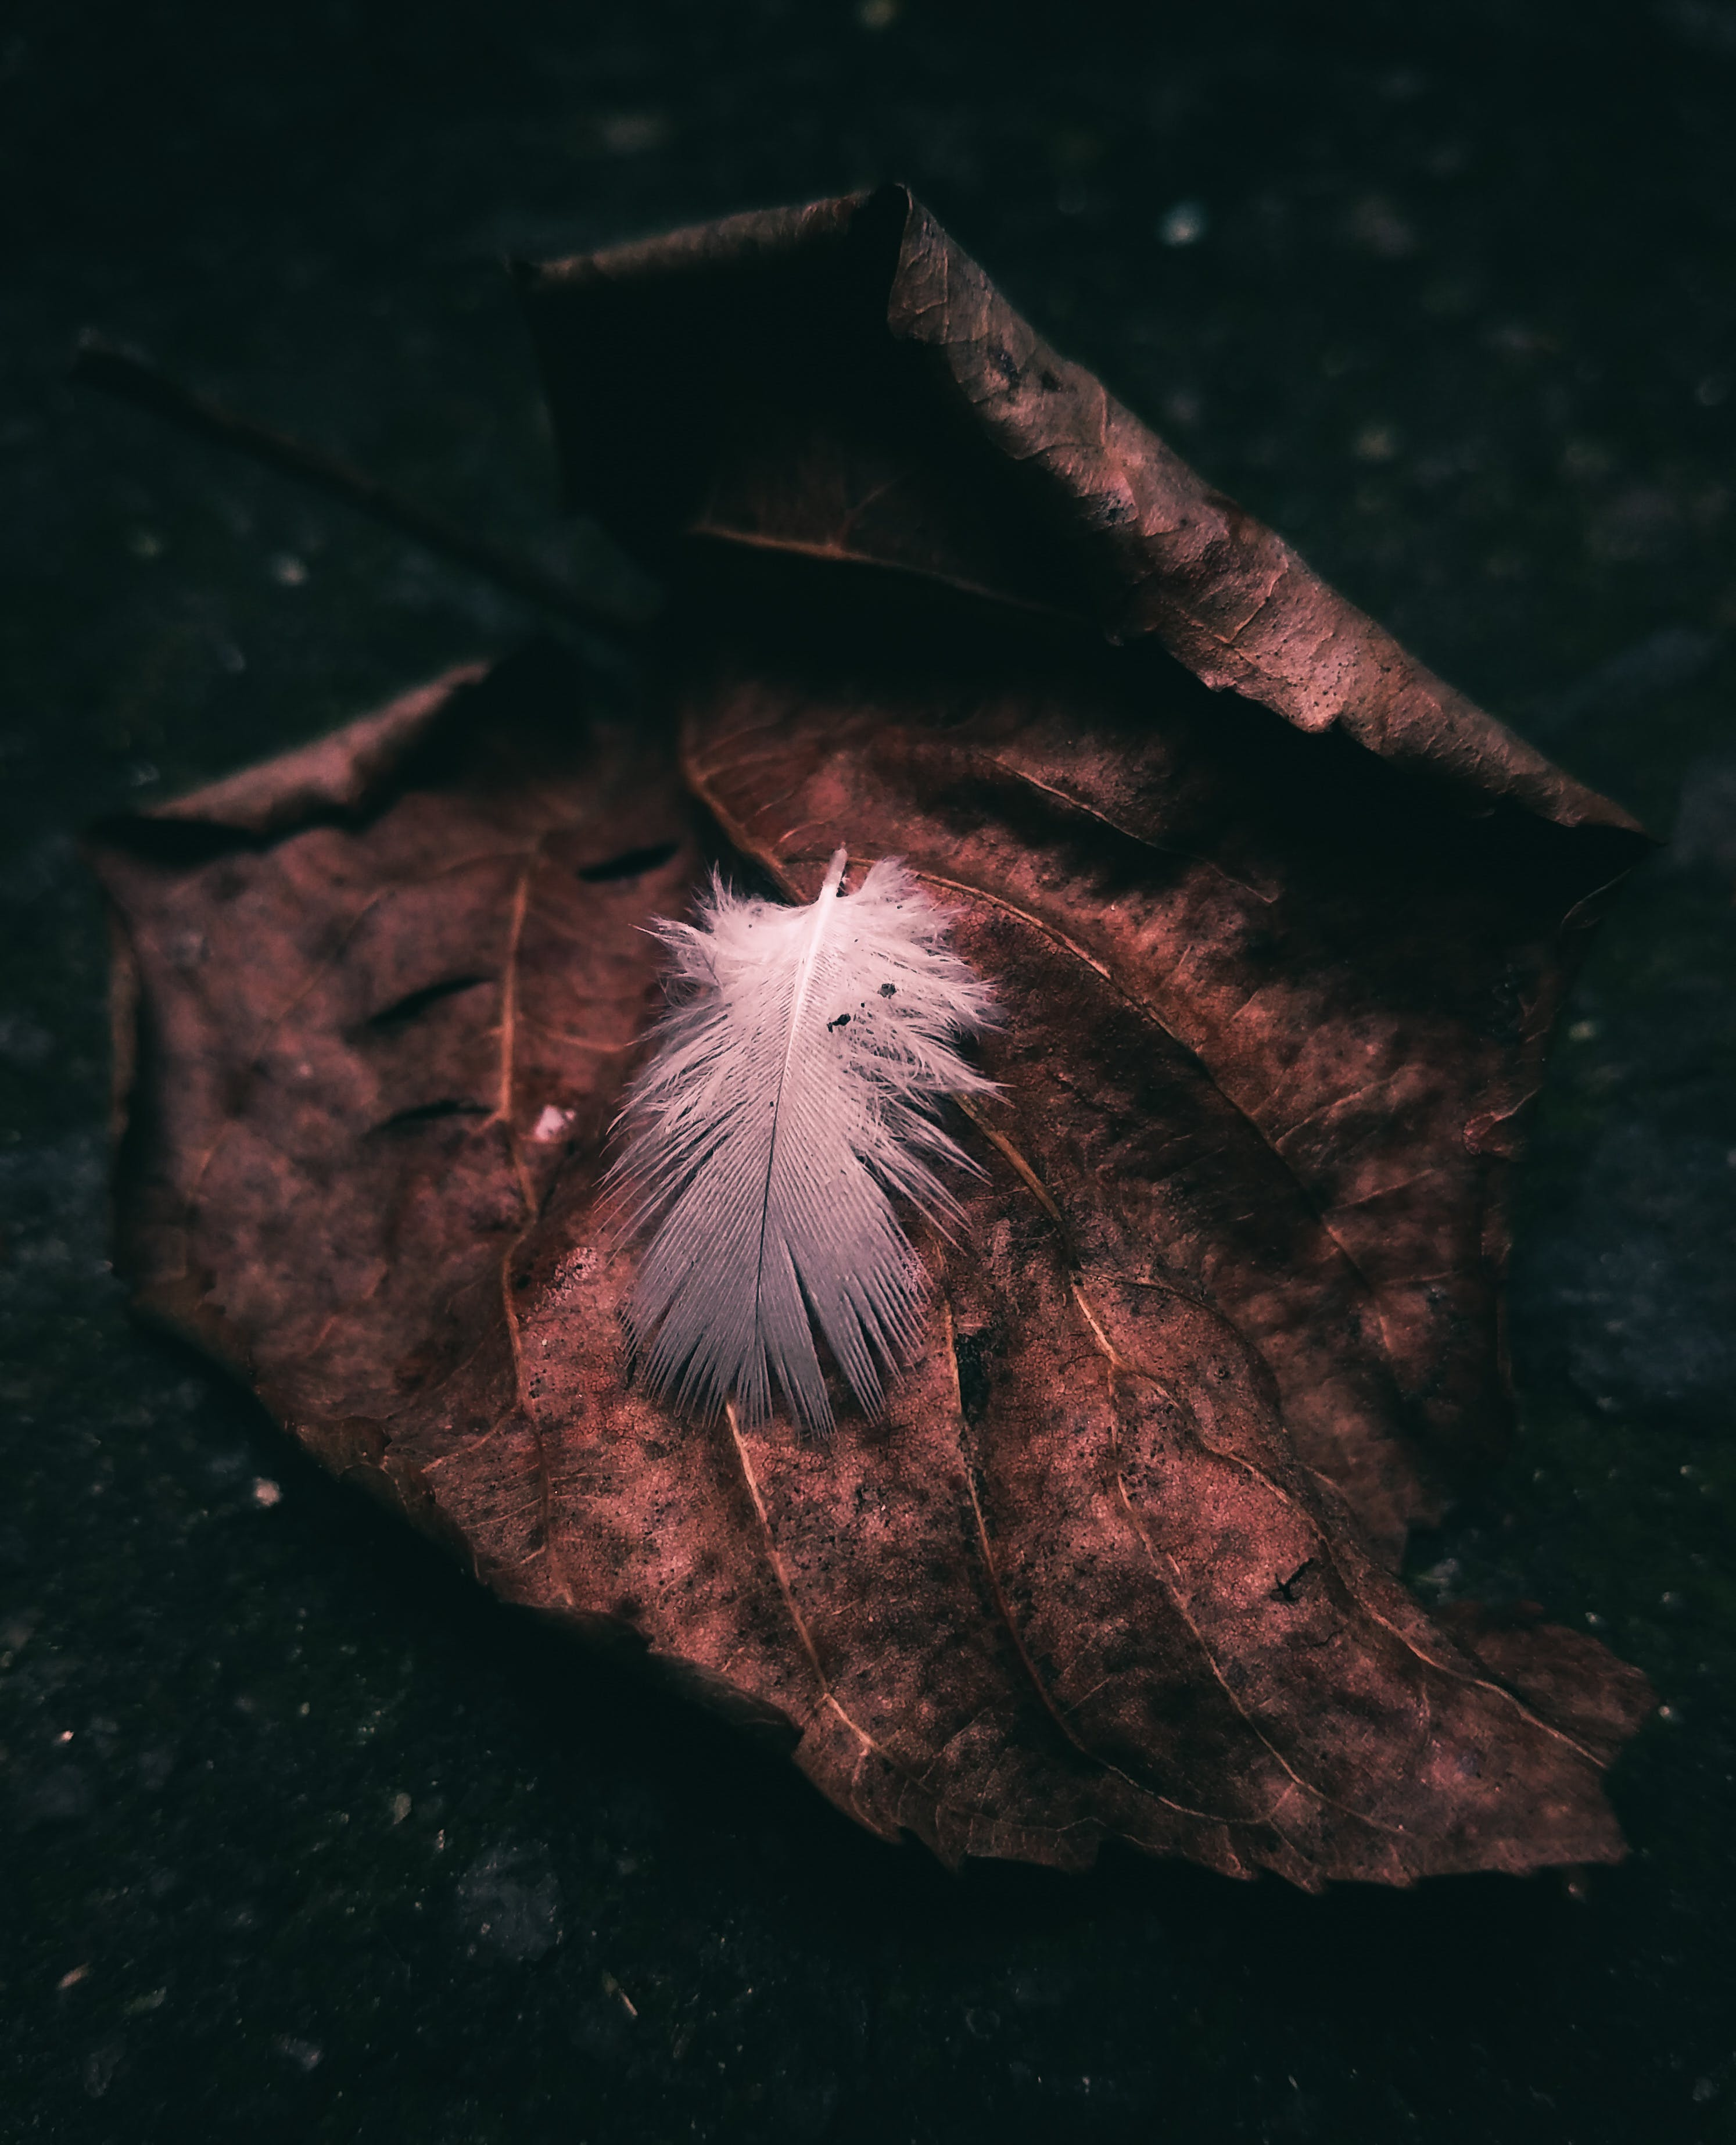 Free stock photo of leaf, autumn, grunge, feather